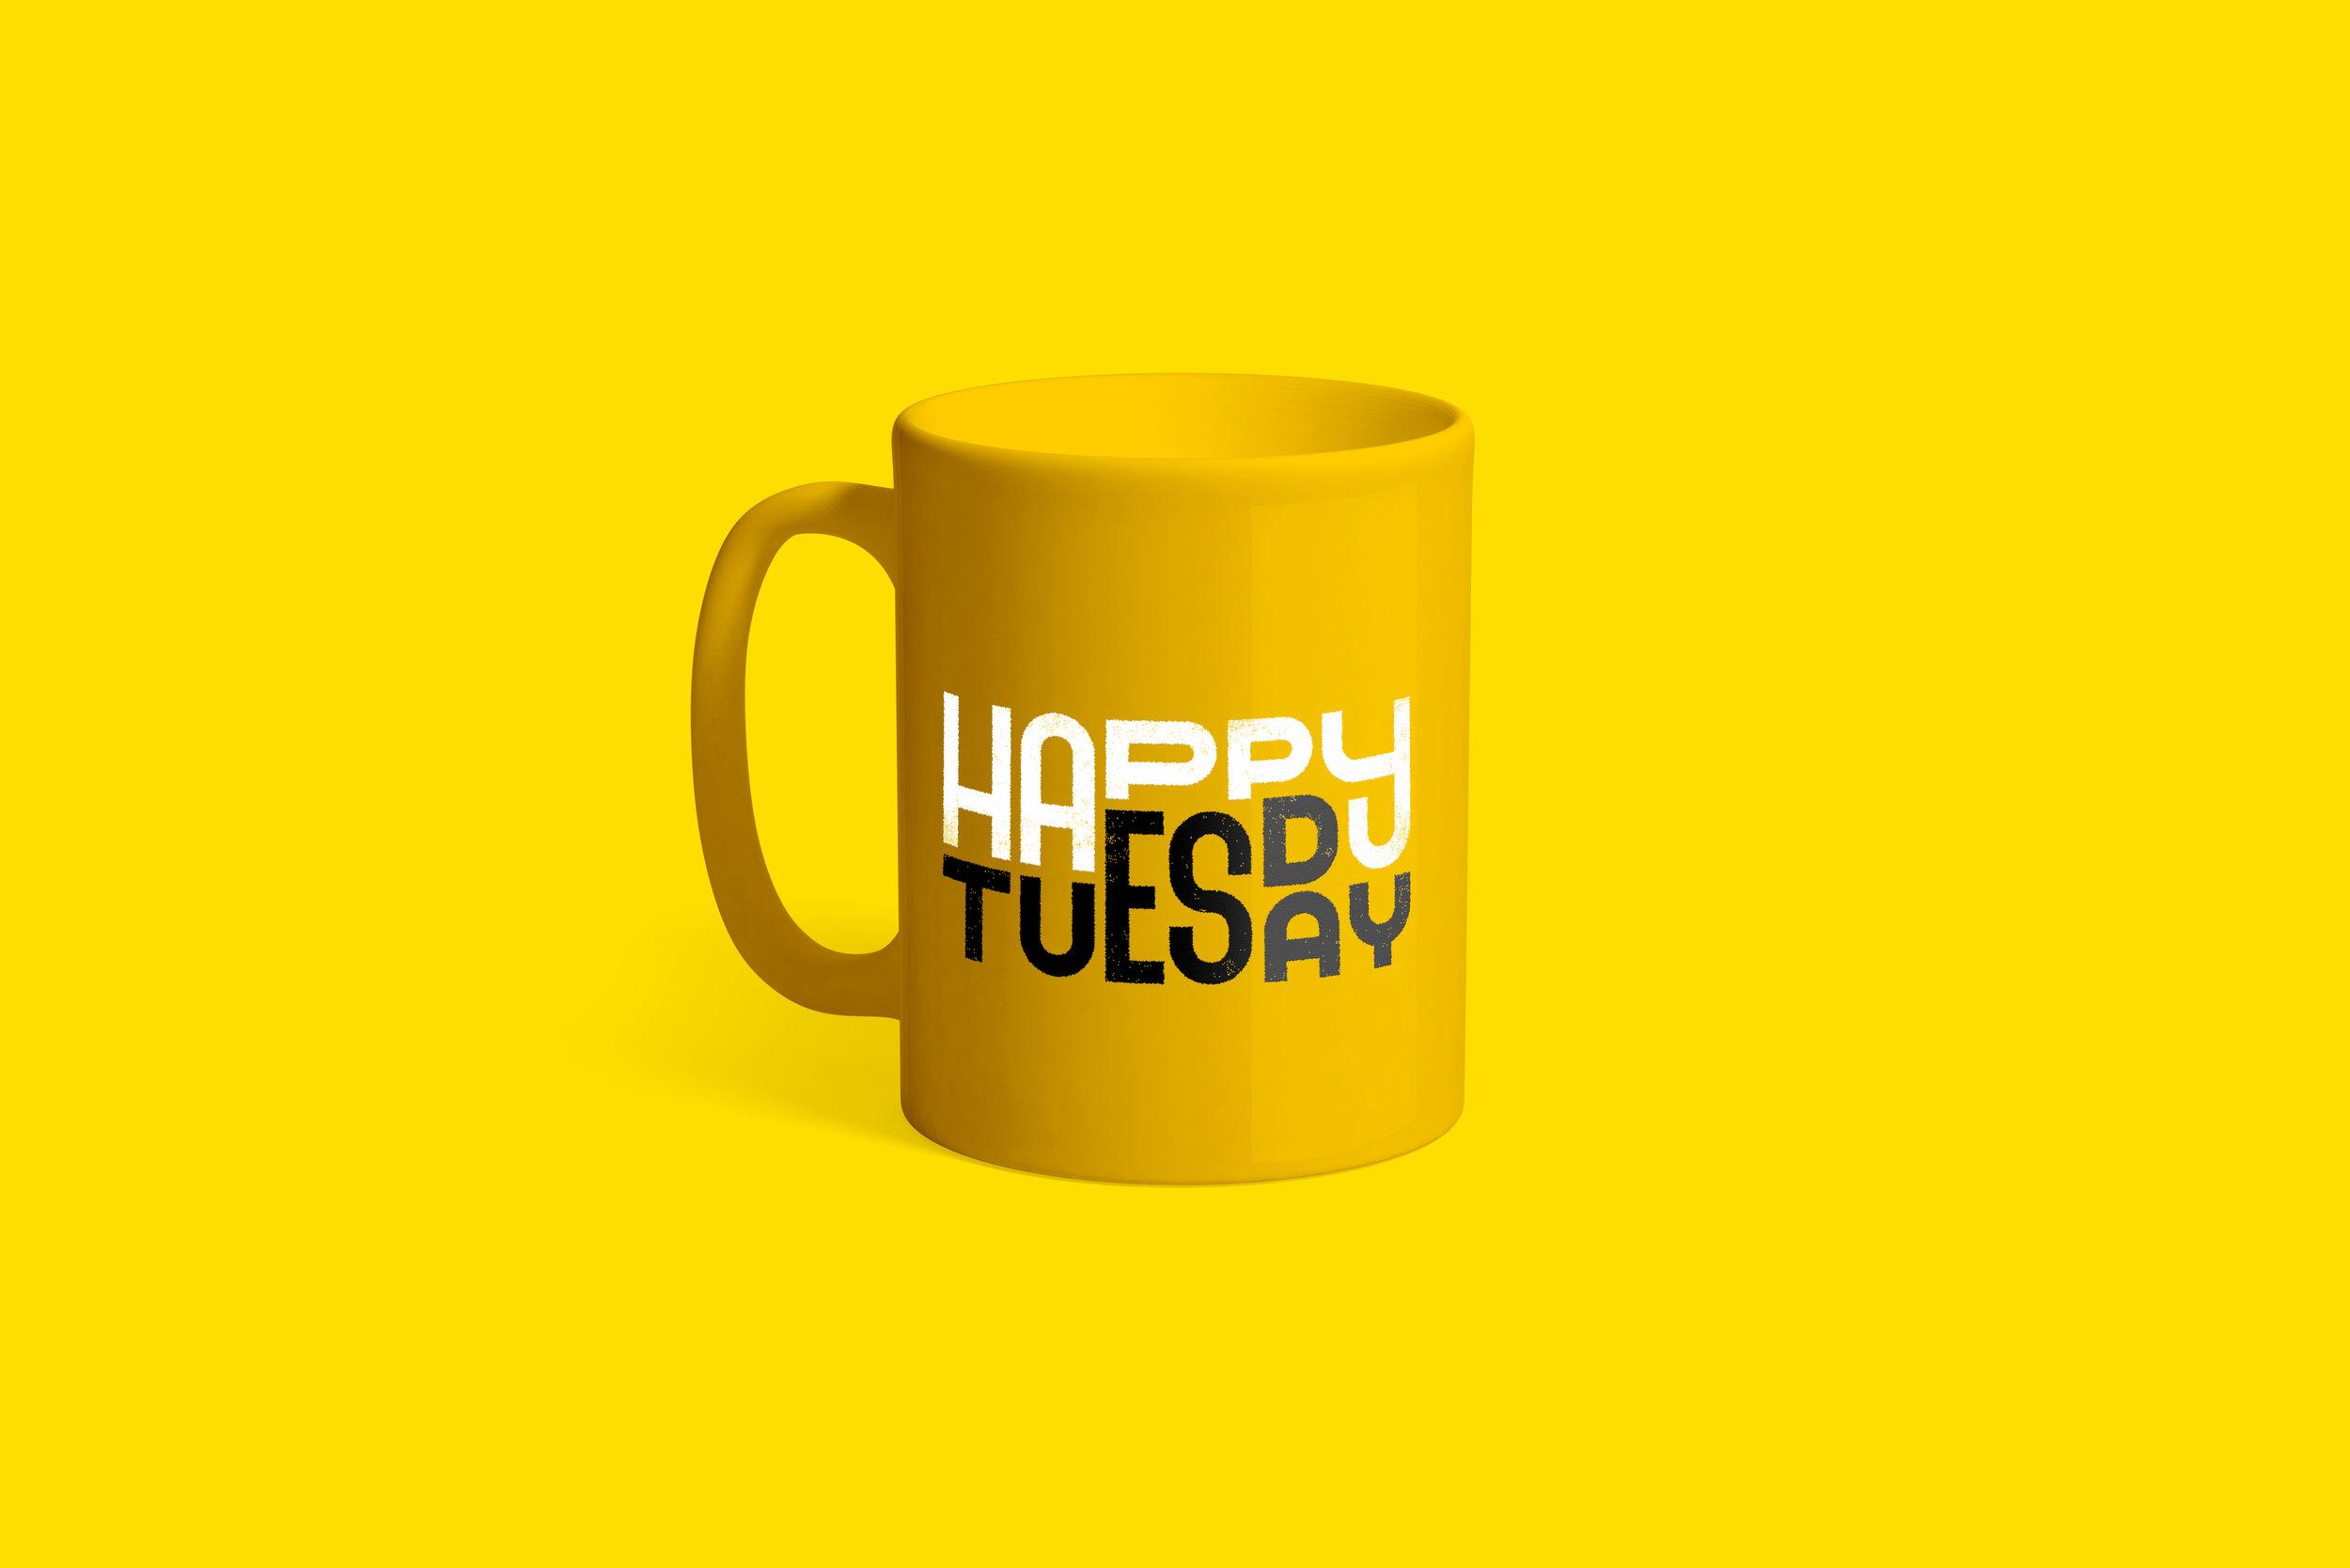 happytuesday_mug.jpg